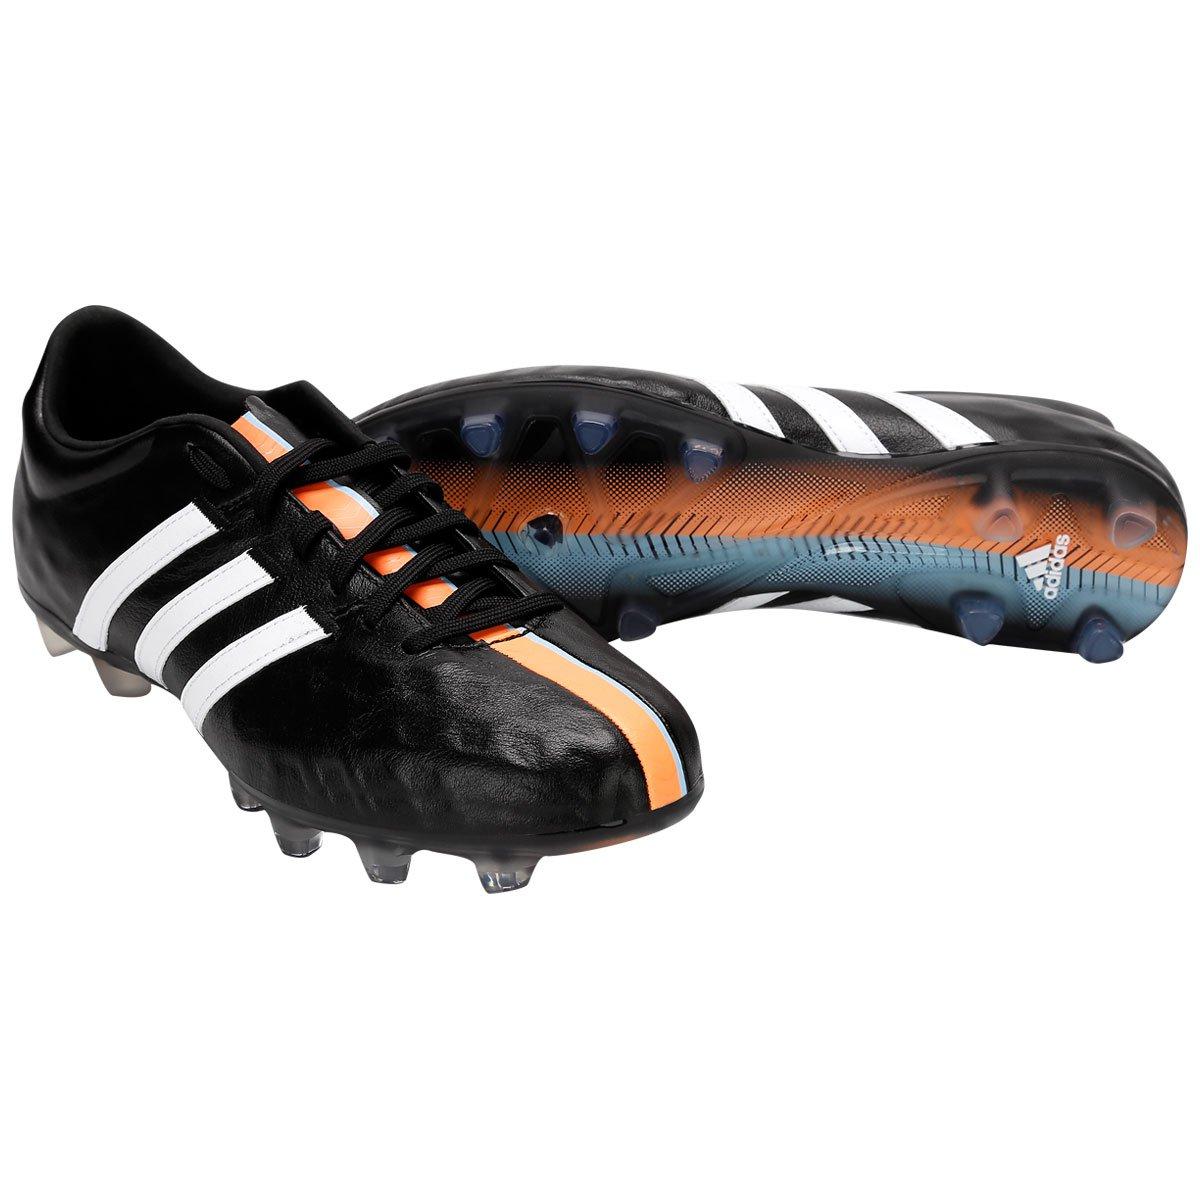 d7a1b19e47c96 Chuteira Adidas 11 Pro FG Campo - Compre Agora